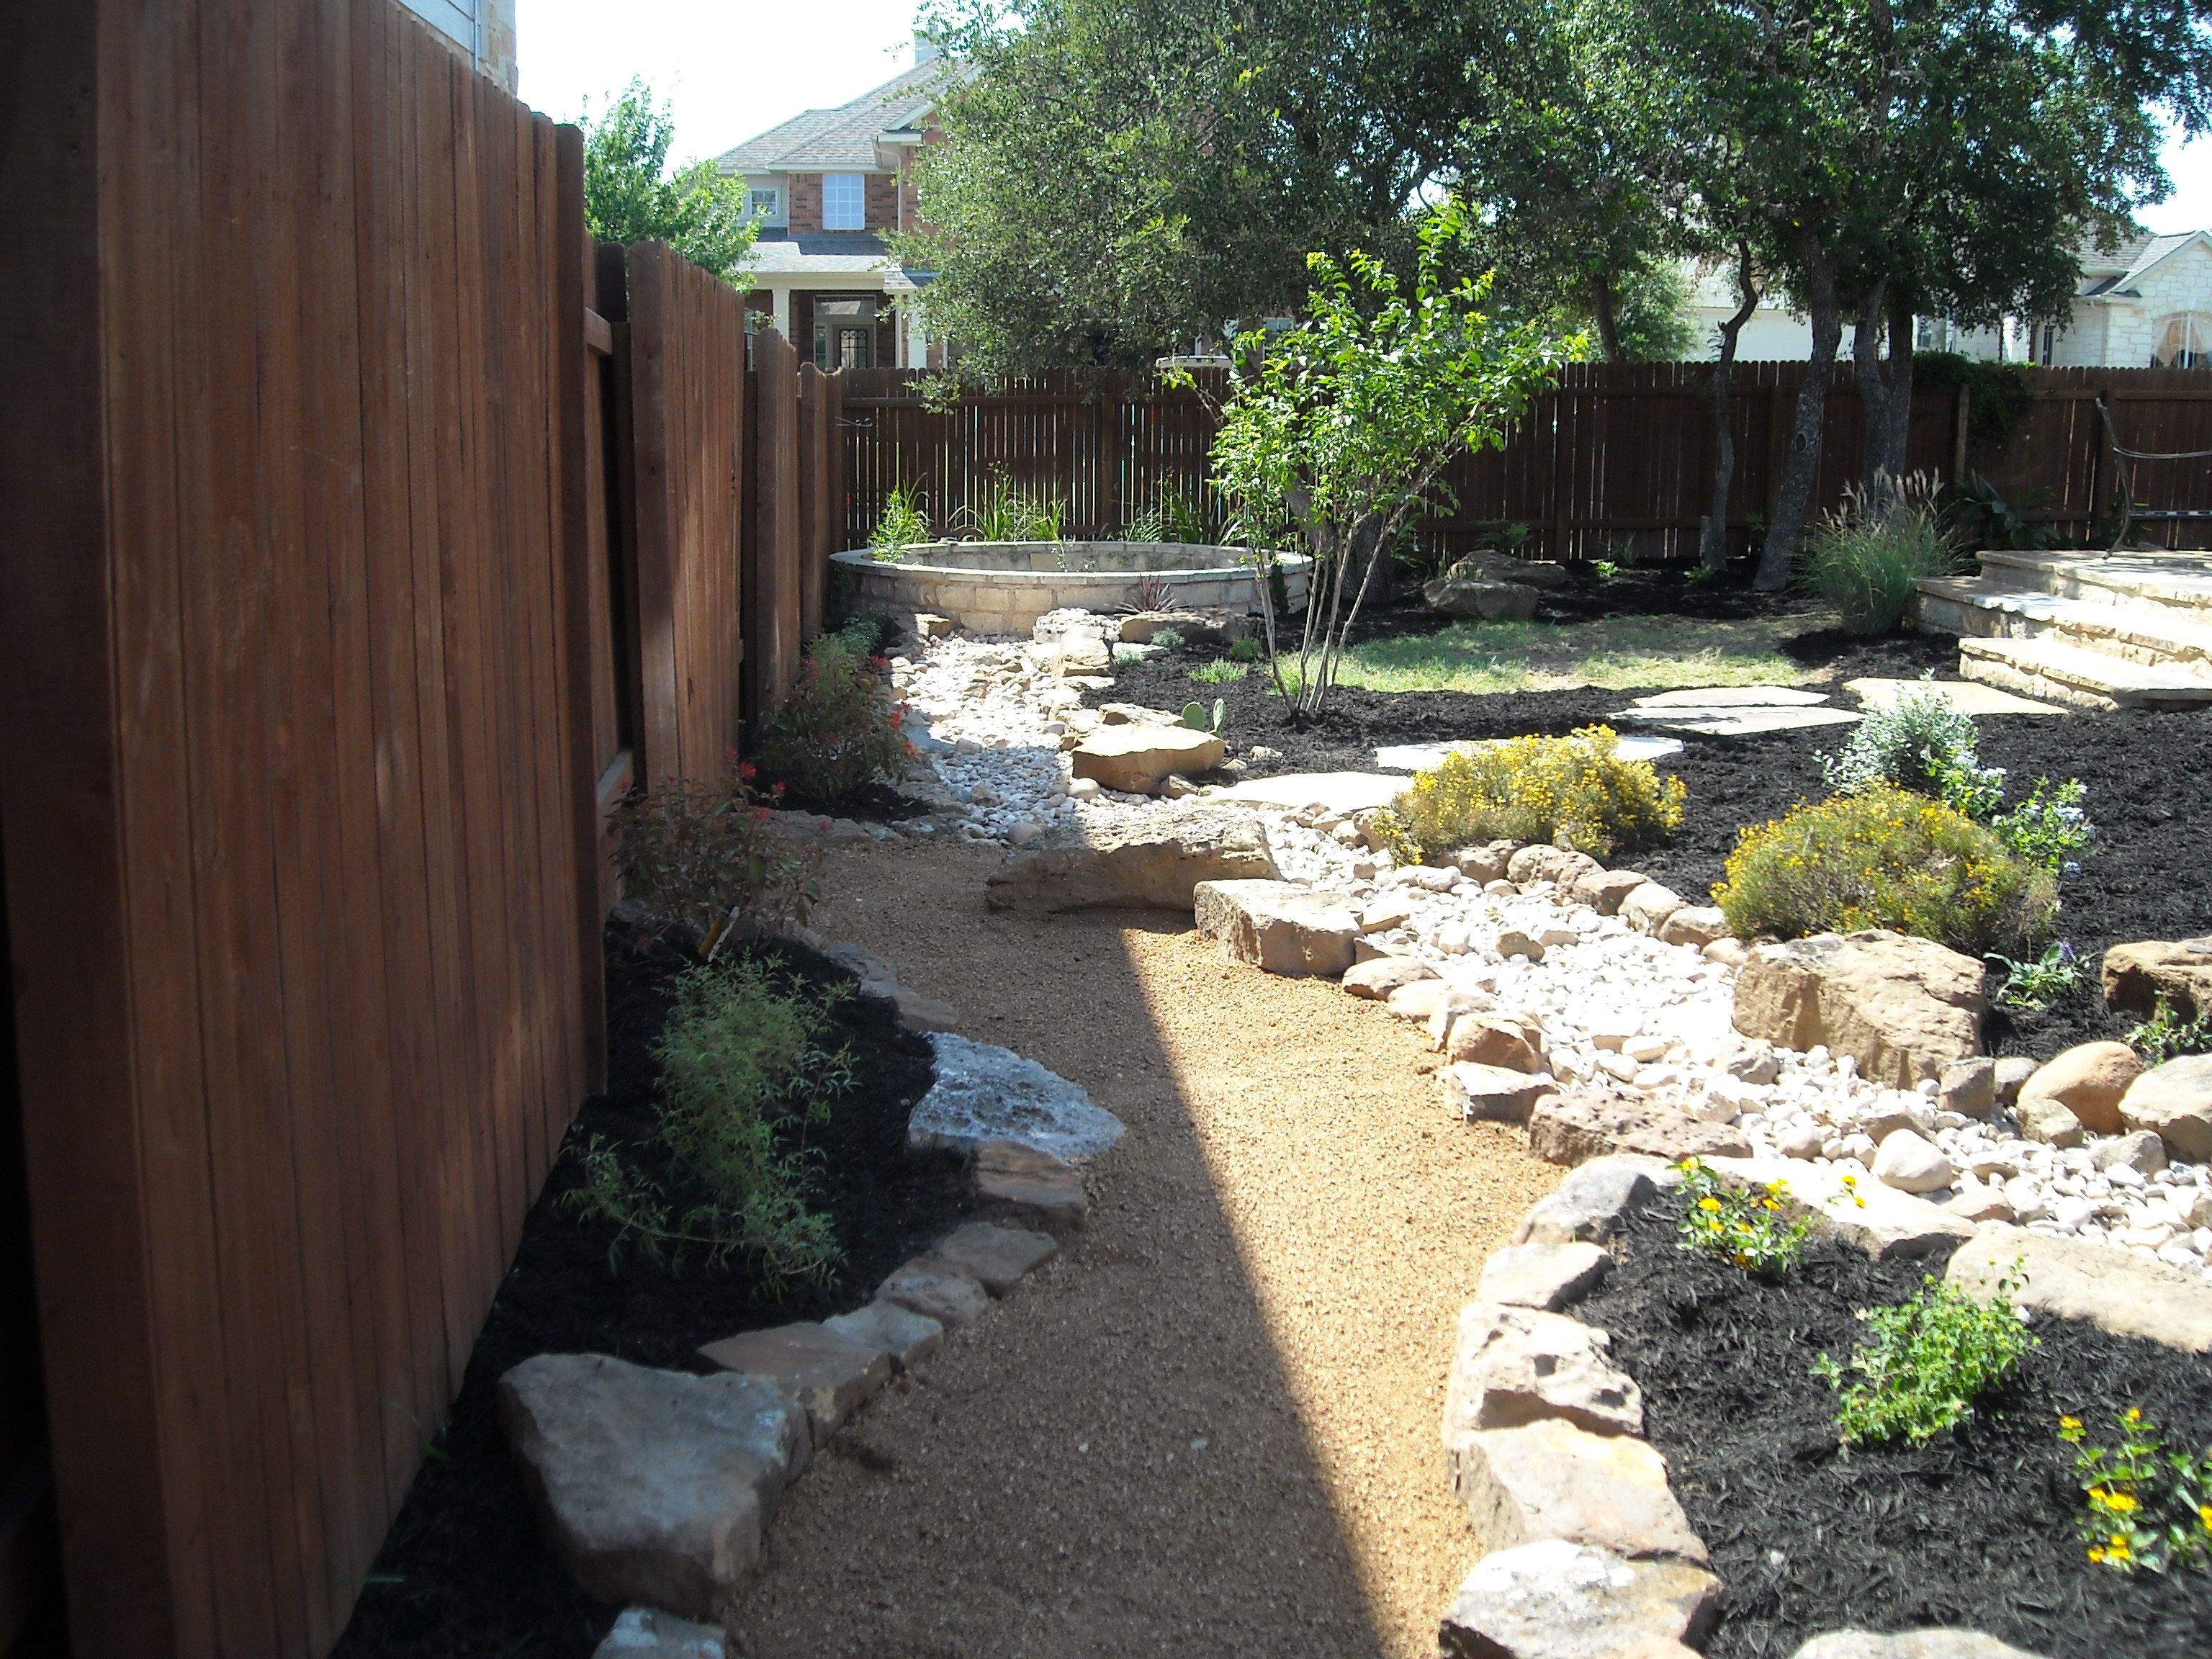 Backyard landscape design using all my favorite elements ... on Backyard Beach Landscape Design id=35298